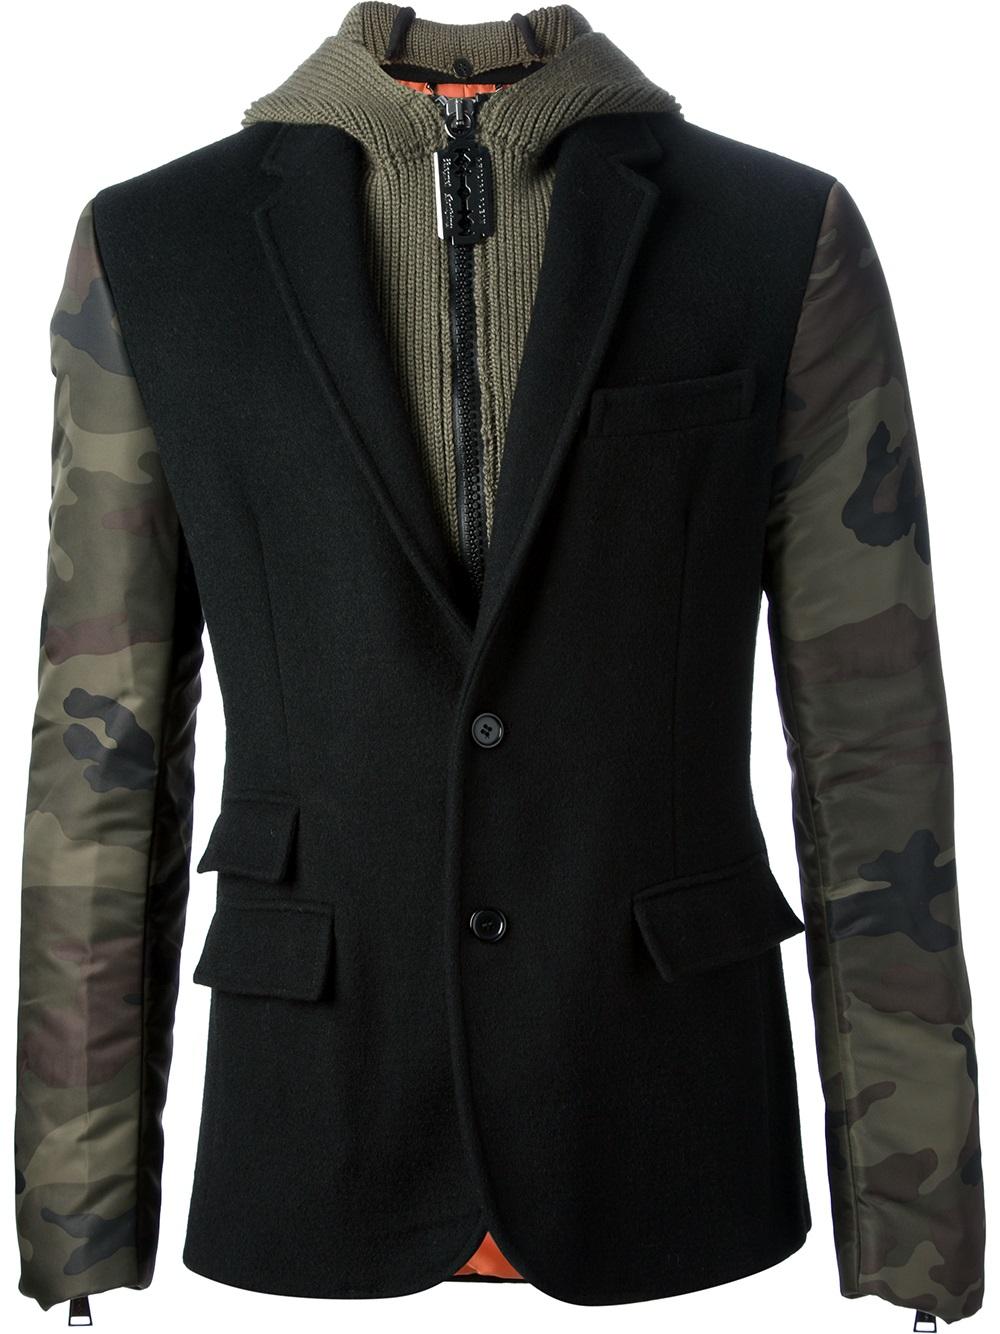 lyst philipp plein hooded blazer jacket in black for men. Black Bedroom Furniture Sets. Home Design Ideas